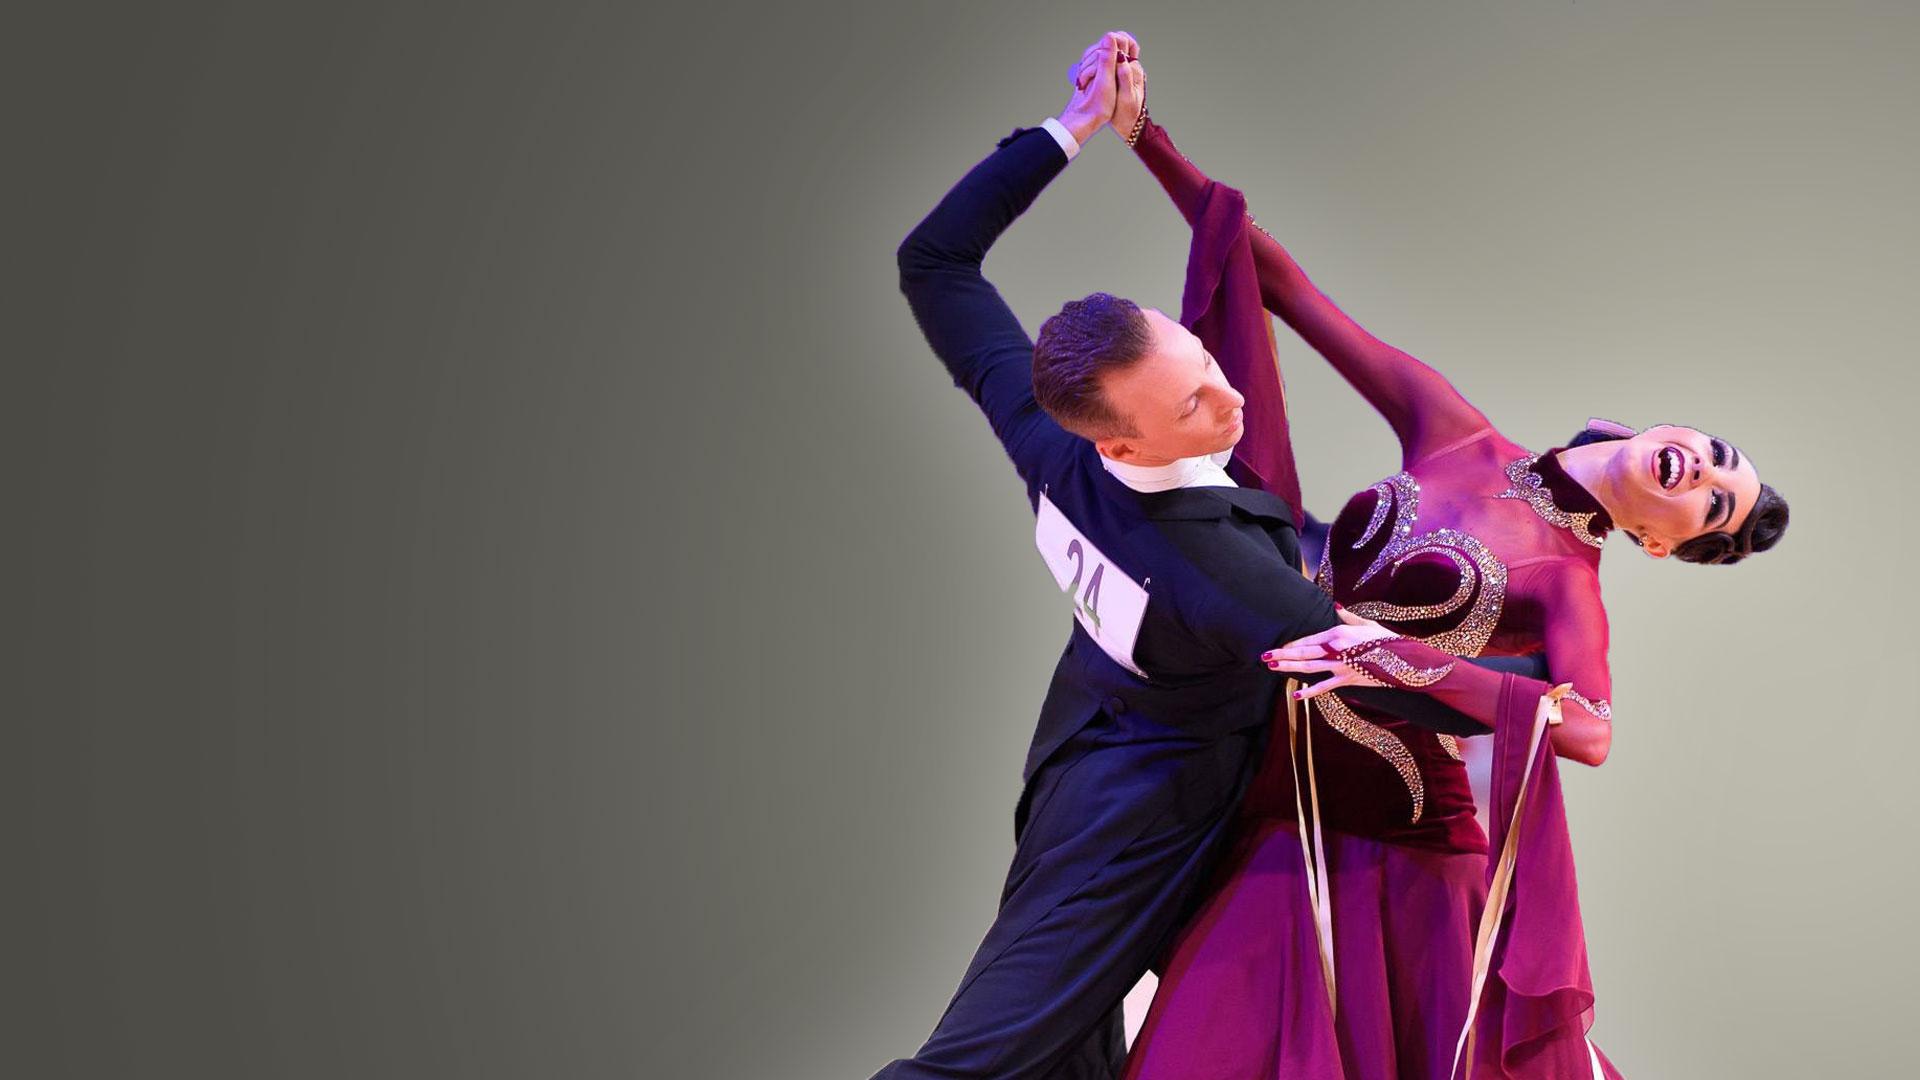 Start your dance journey now!